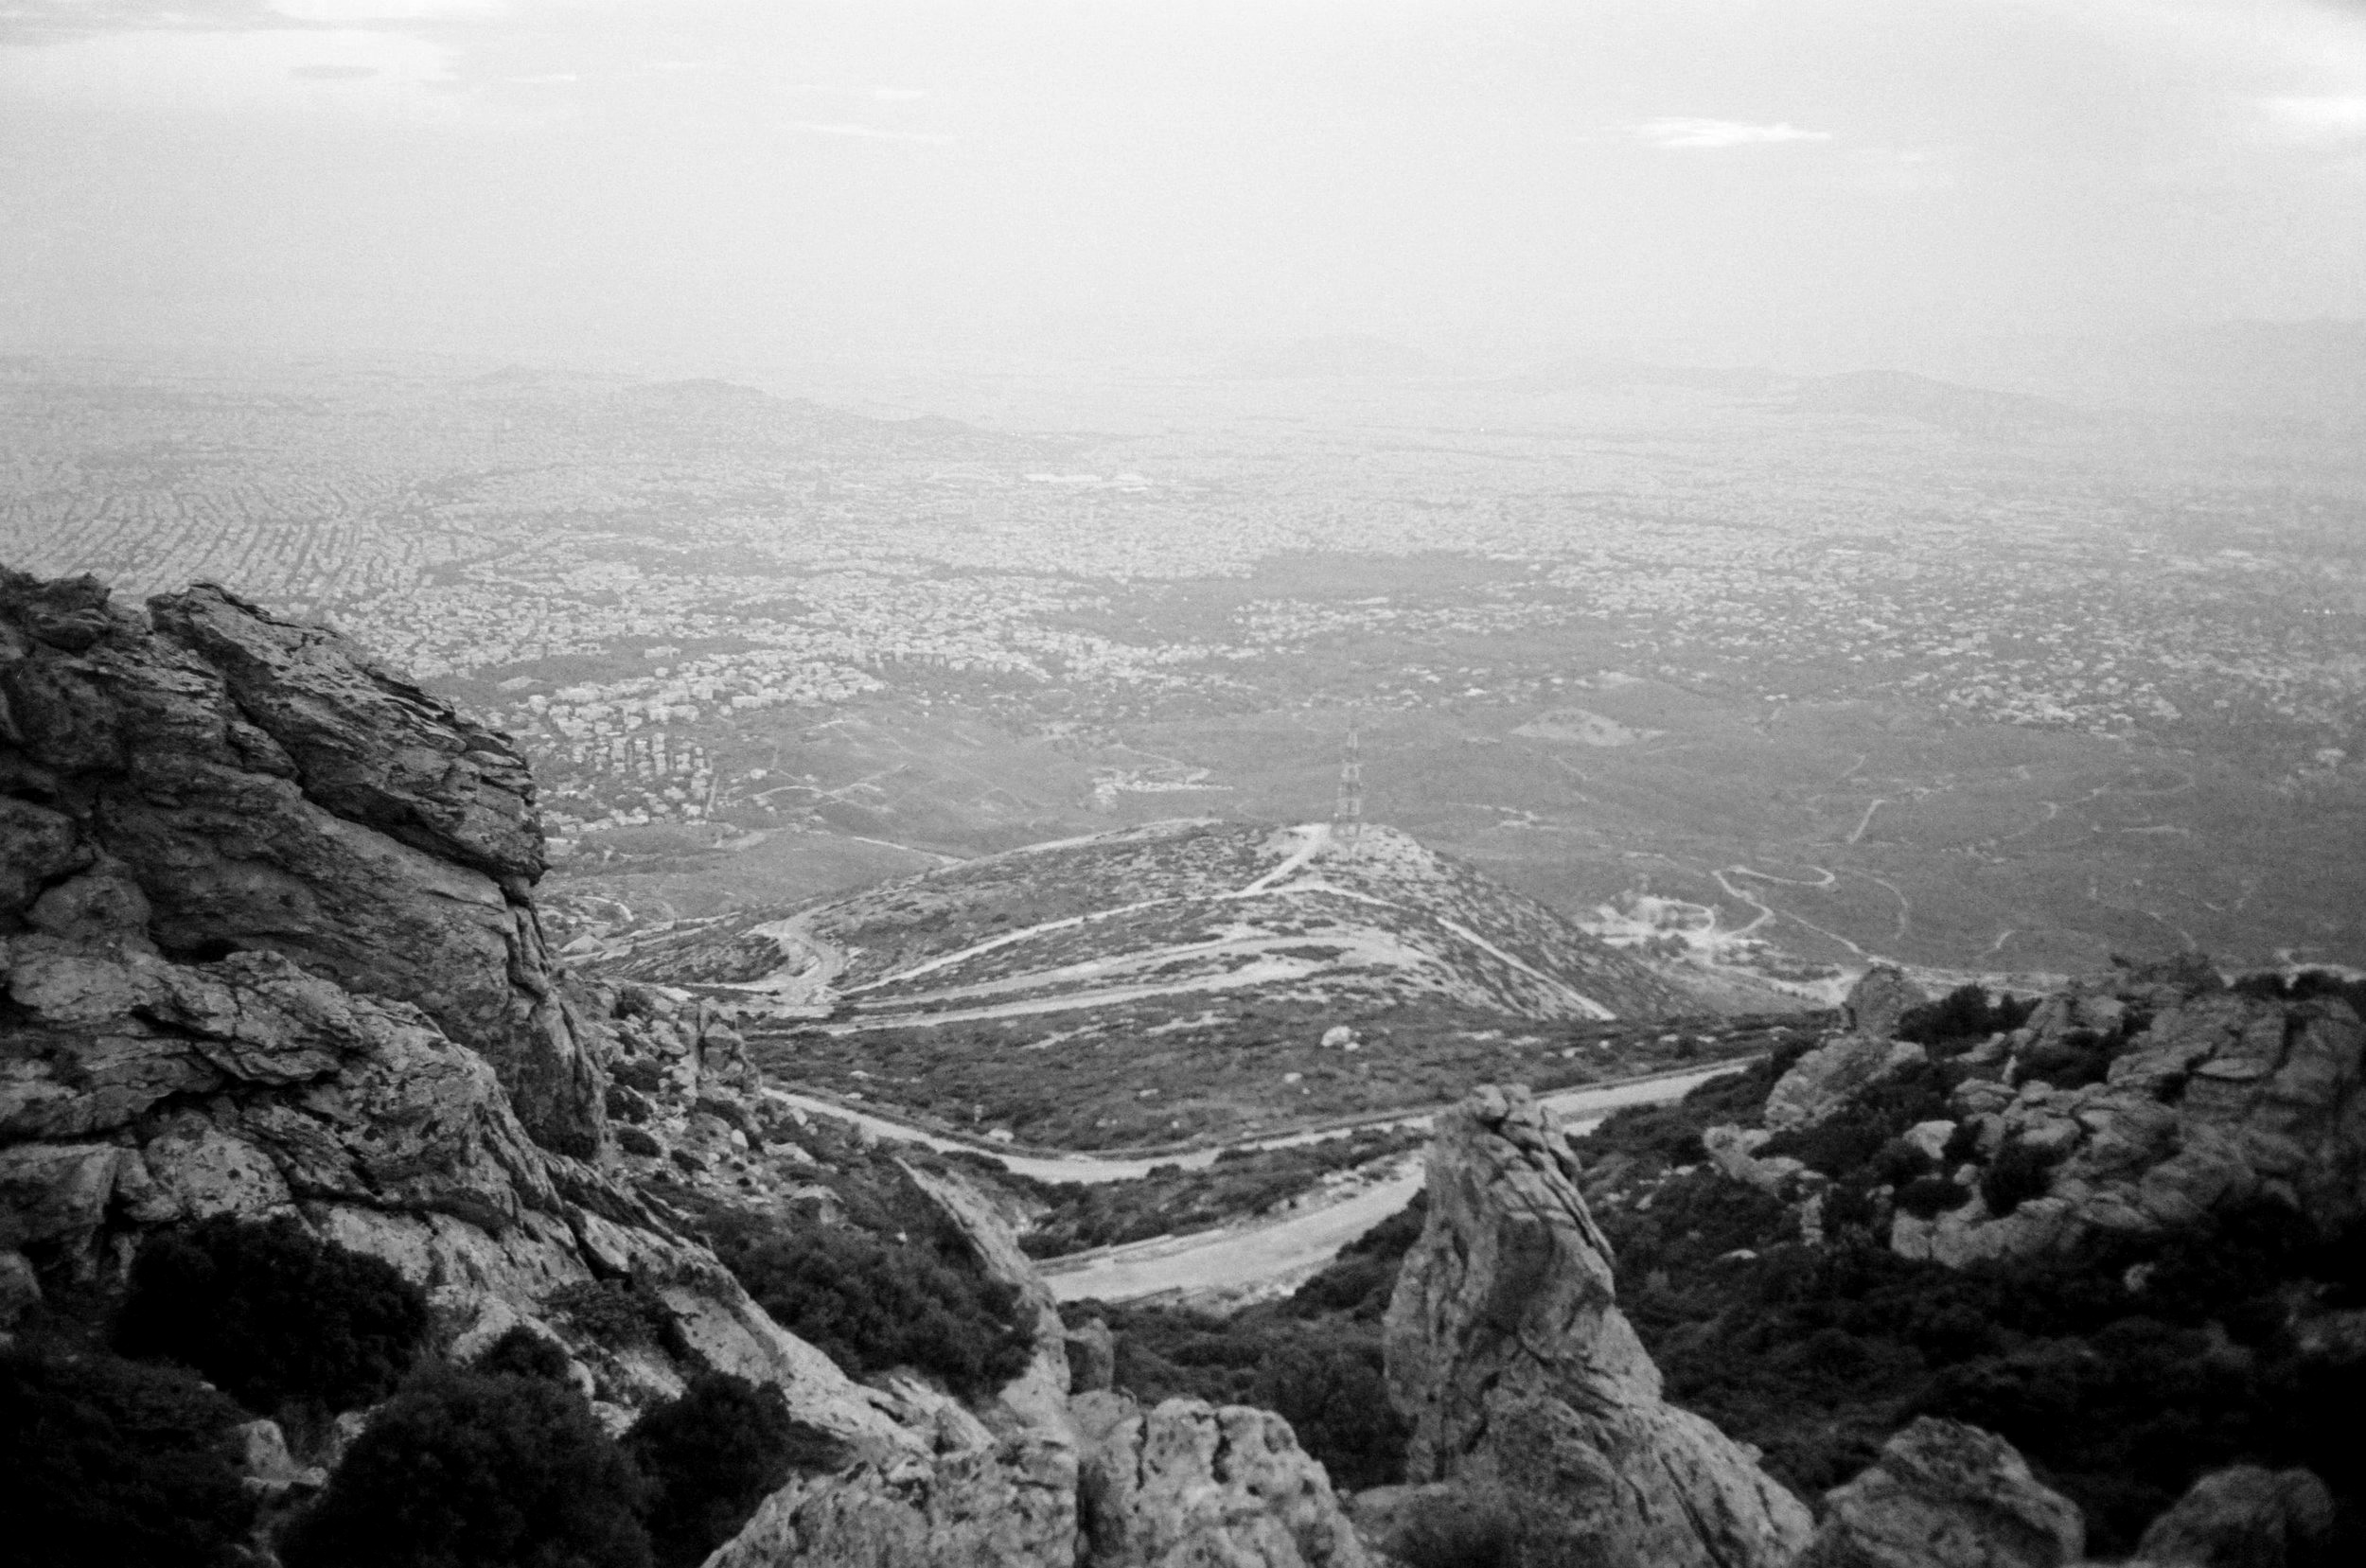 0019_18_ChristosVourlis_photography_CVHAIR_CVDIARY_personal diary__film_35mm_photo.jpg